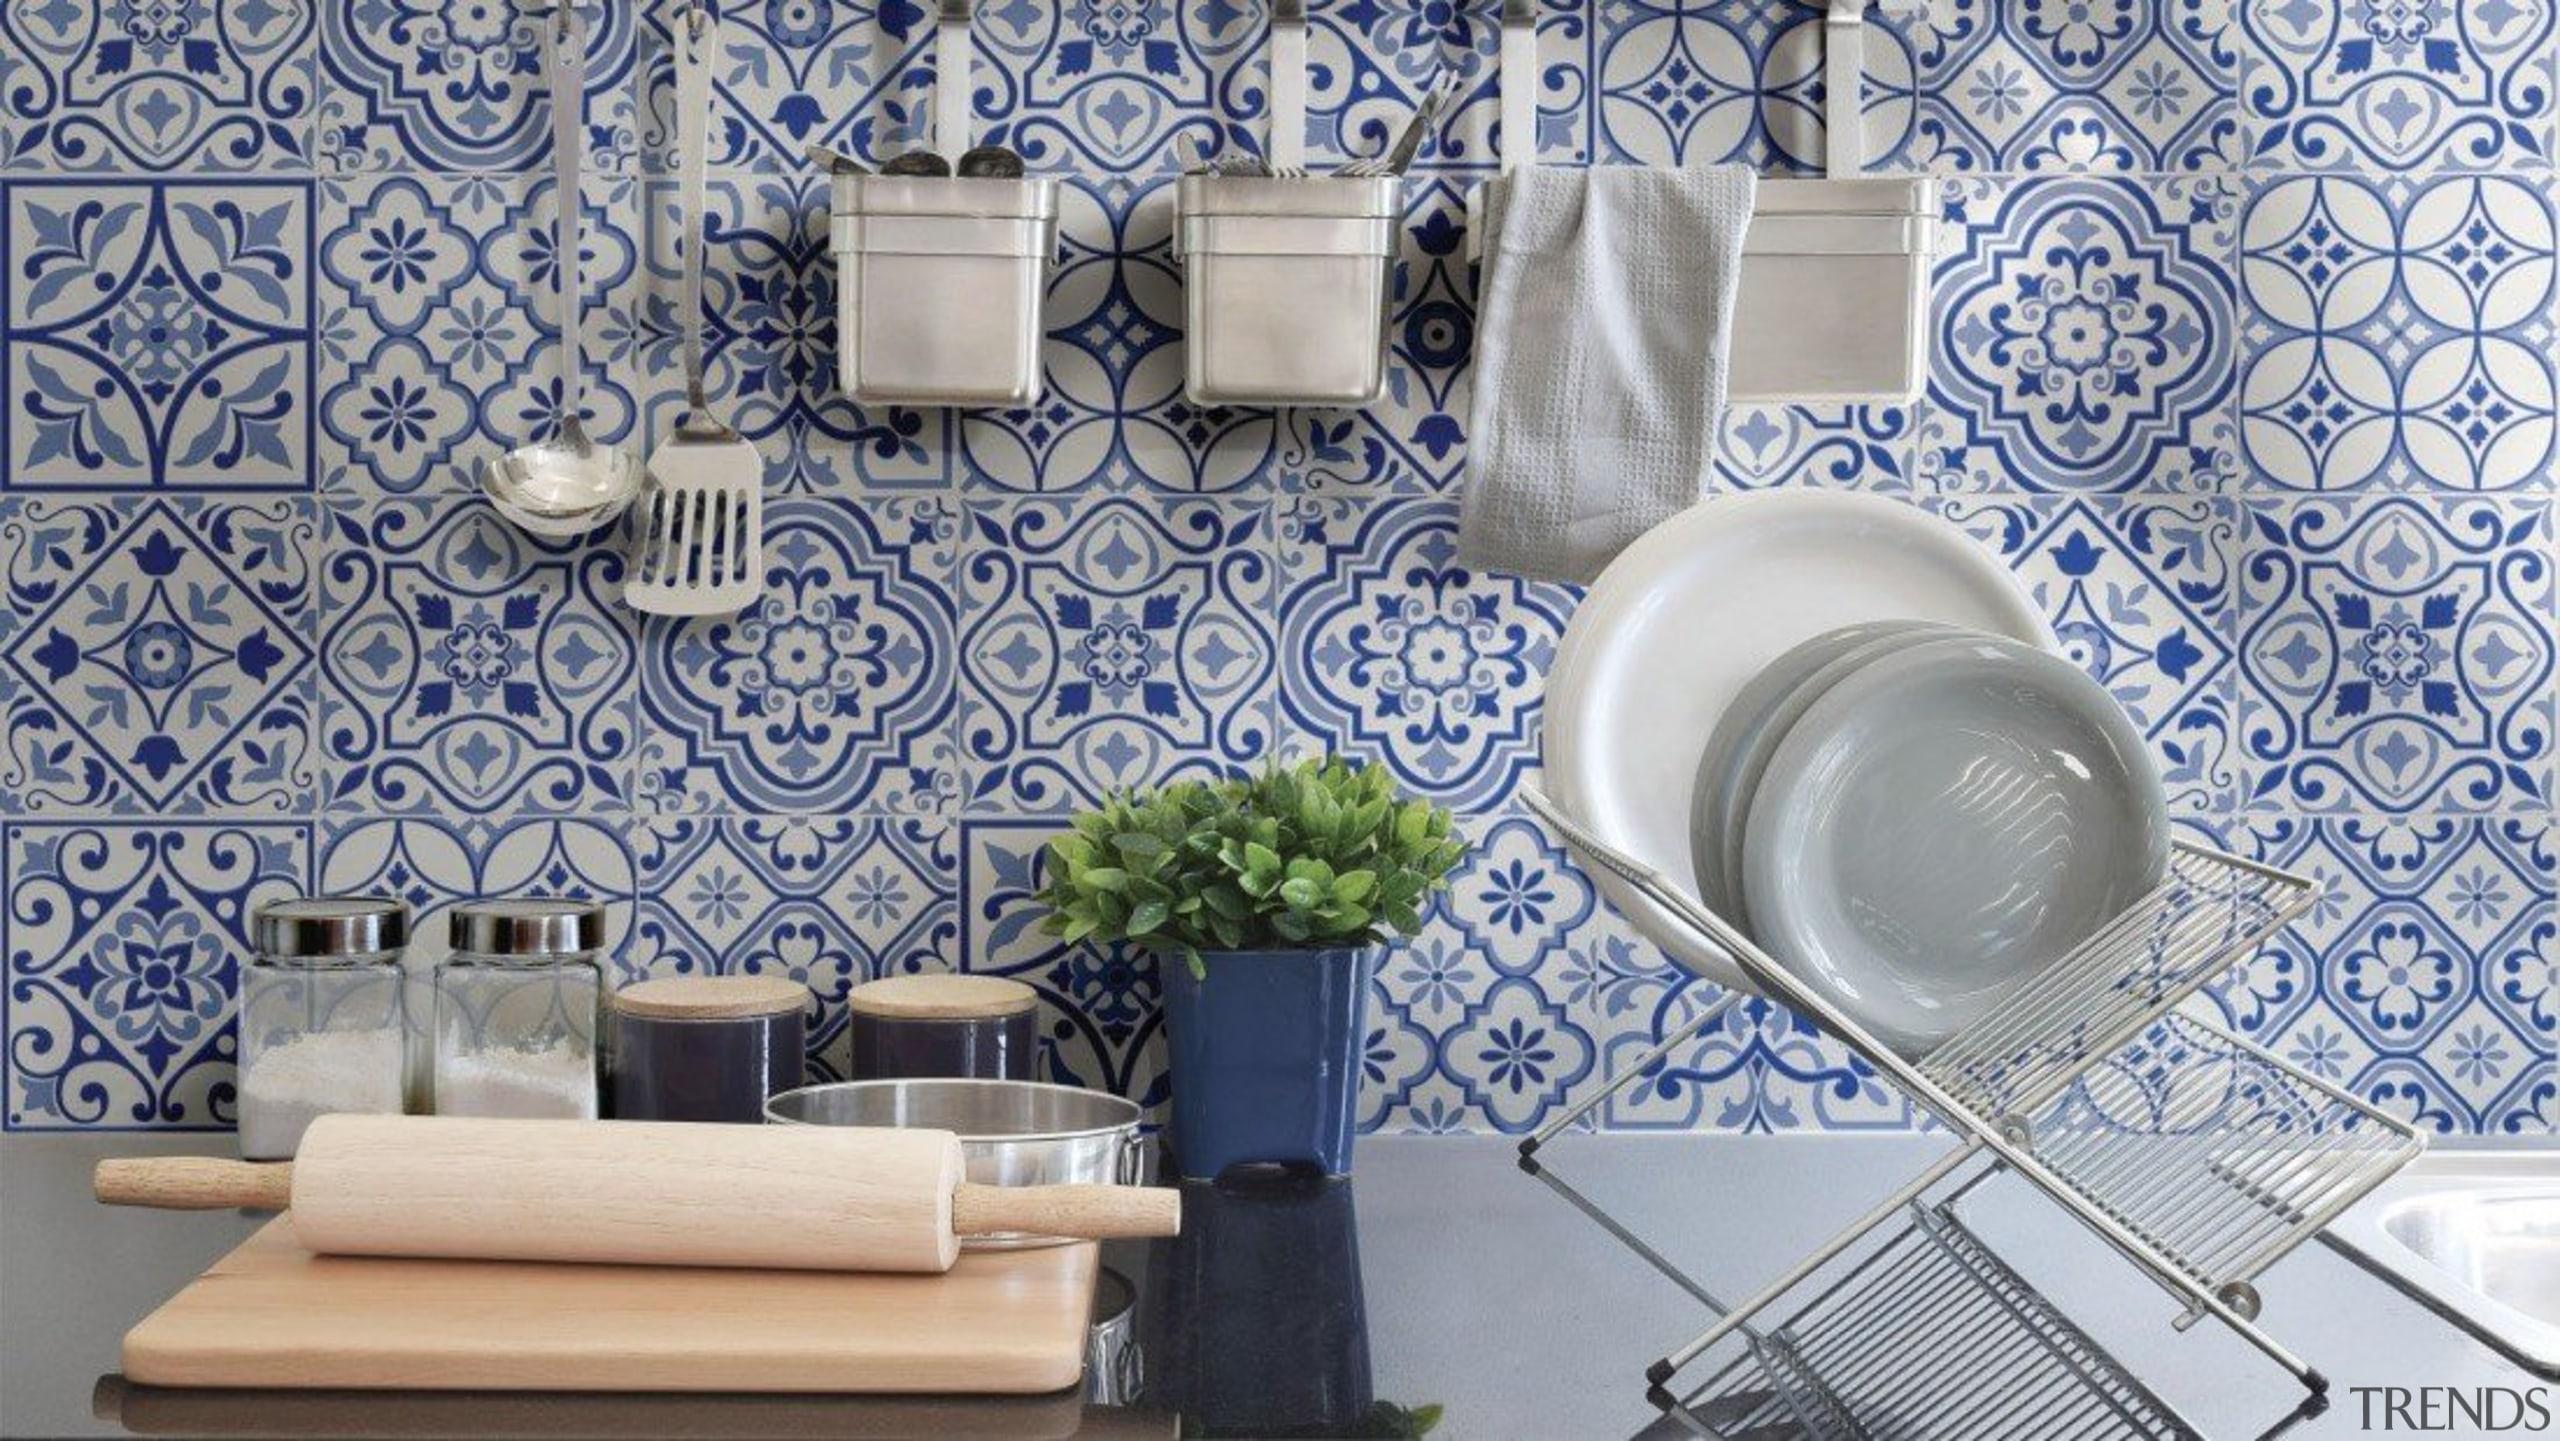 City Glamour - City Glamour - blue | blue, ceramic, home, interior design, living room, tile, wall, wallpaper, gray